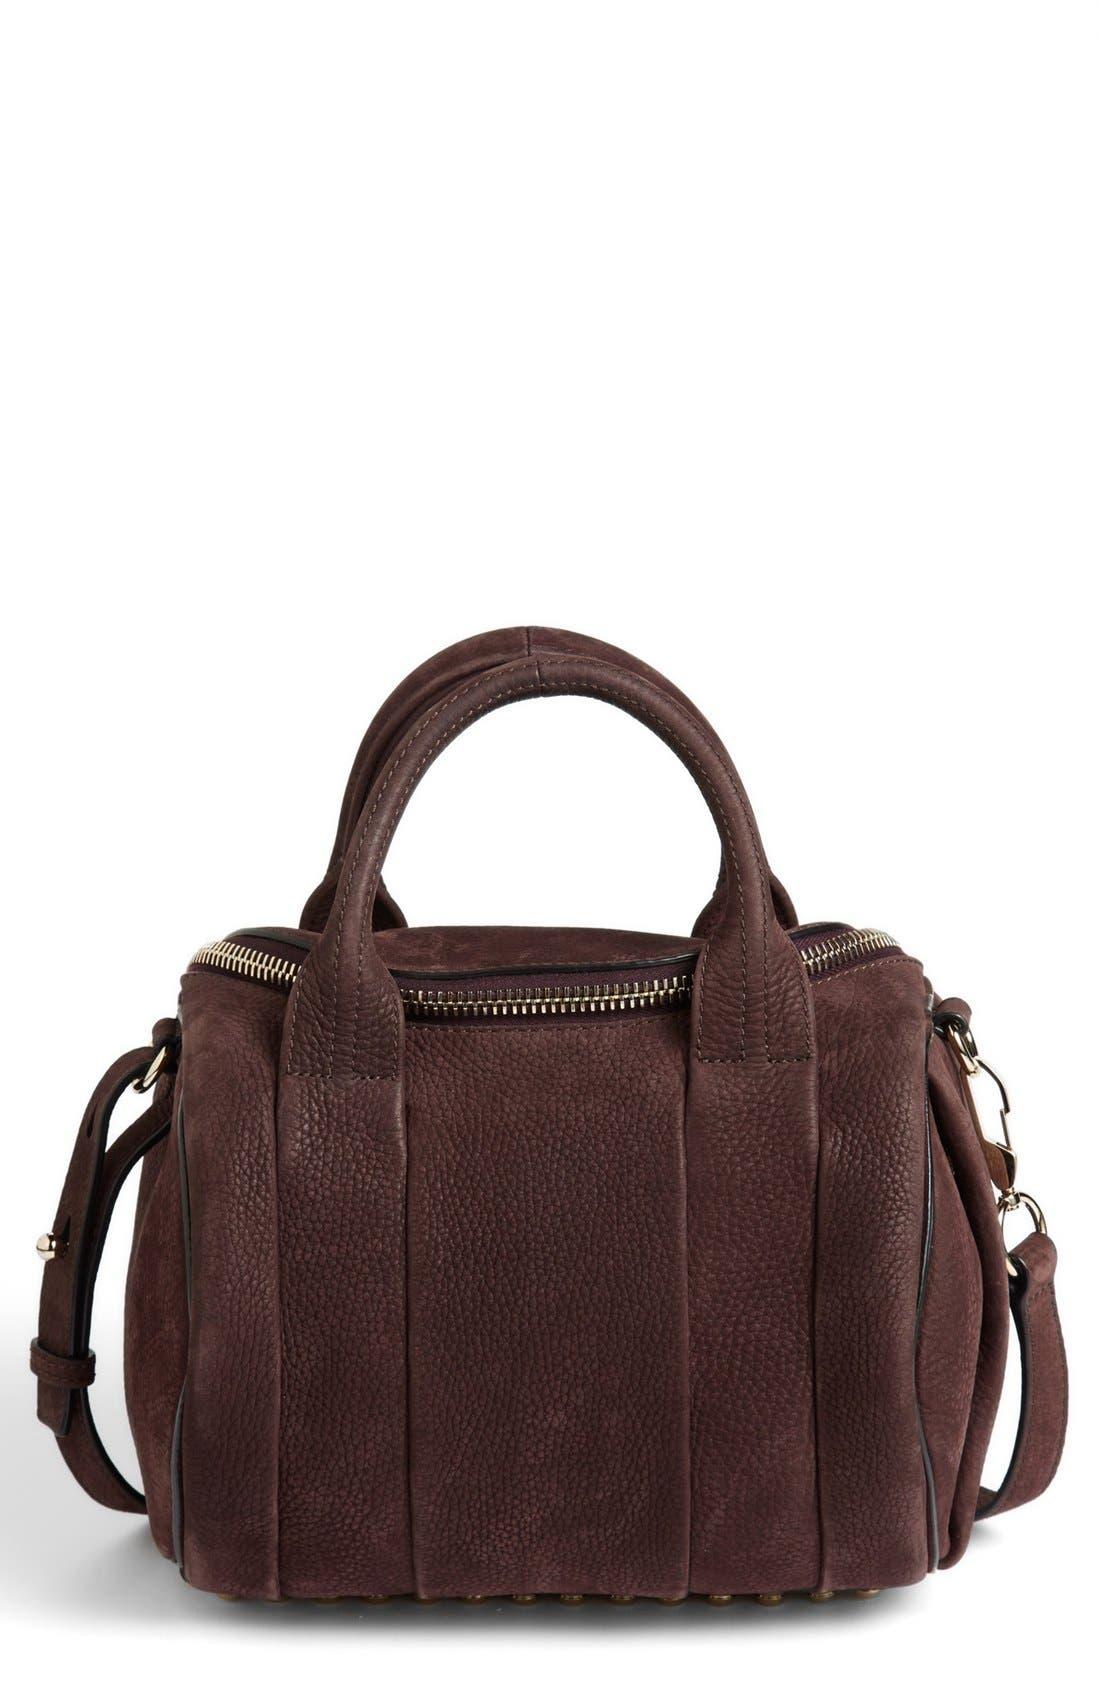 Alternate Image 1 Selected - Alexander Wang 'Rockie - Pale Gold' Nubuck Leather Crossbody Bag